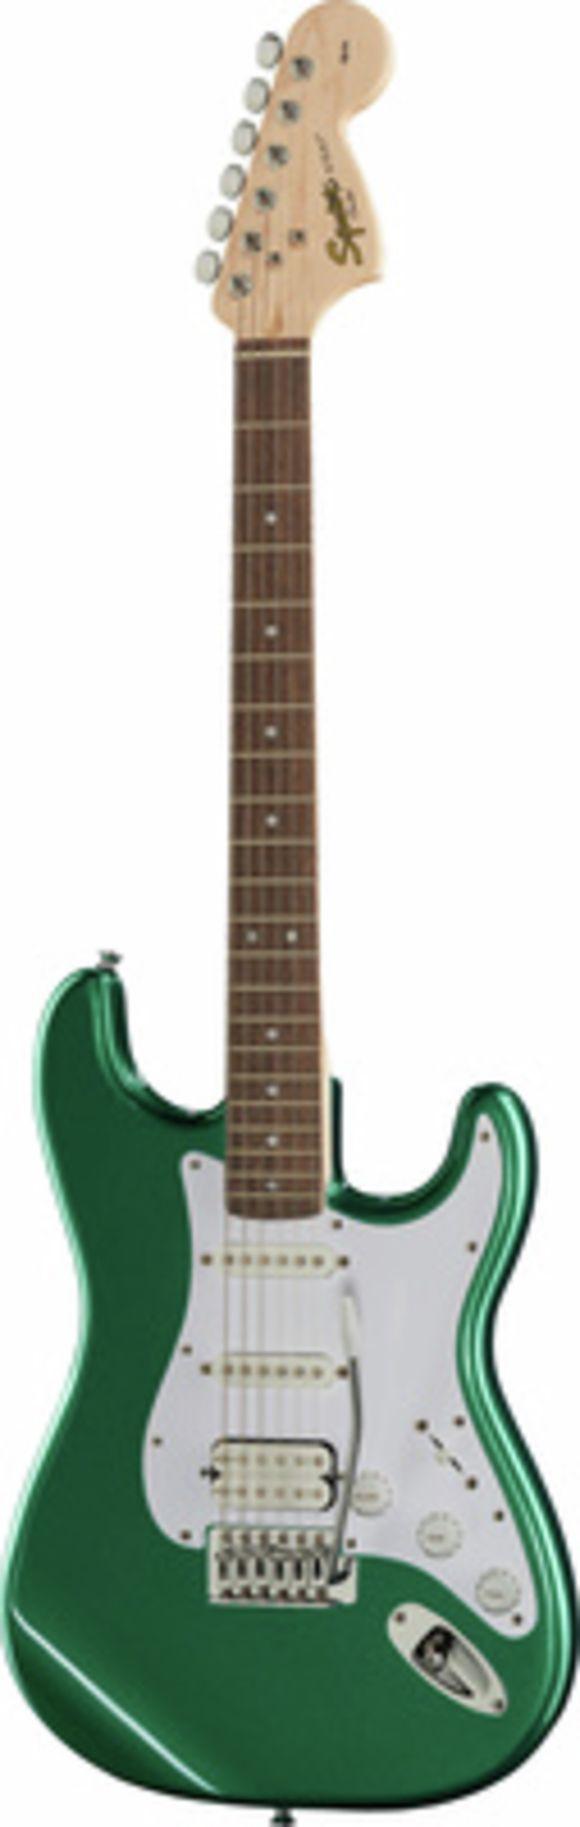 SQ Affinity Strat HSS RG IL Fender